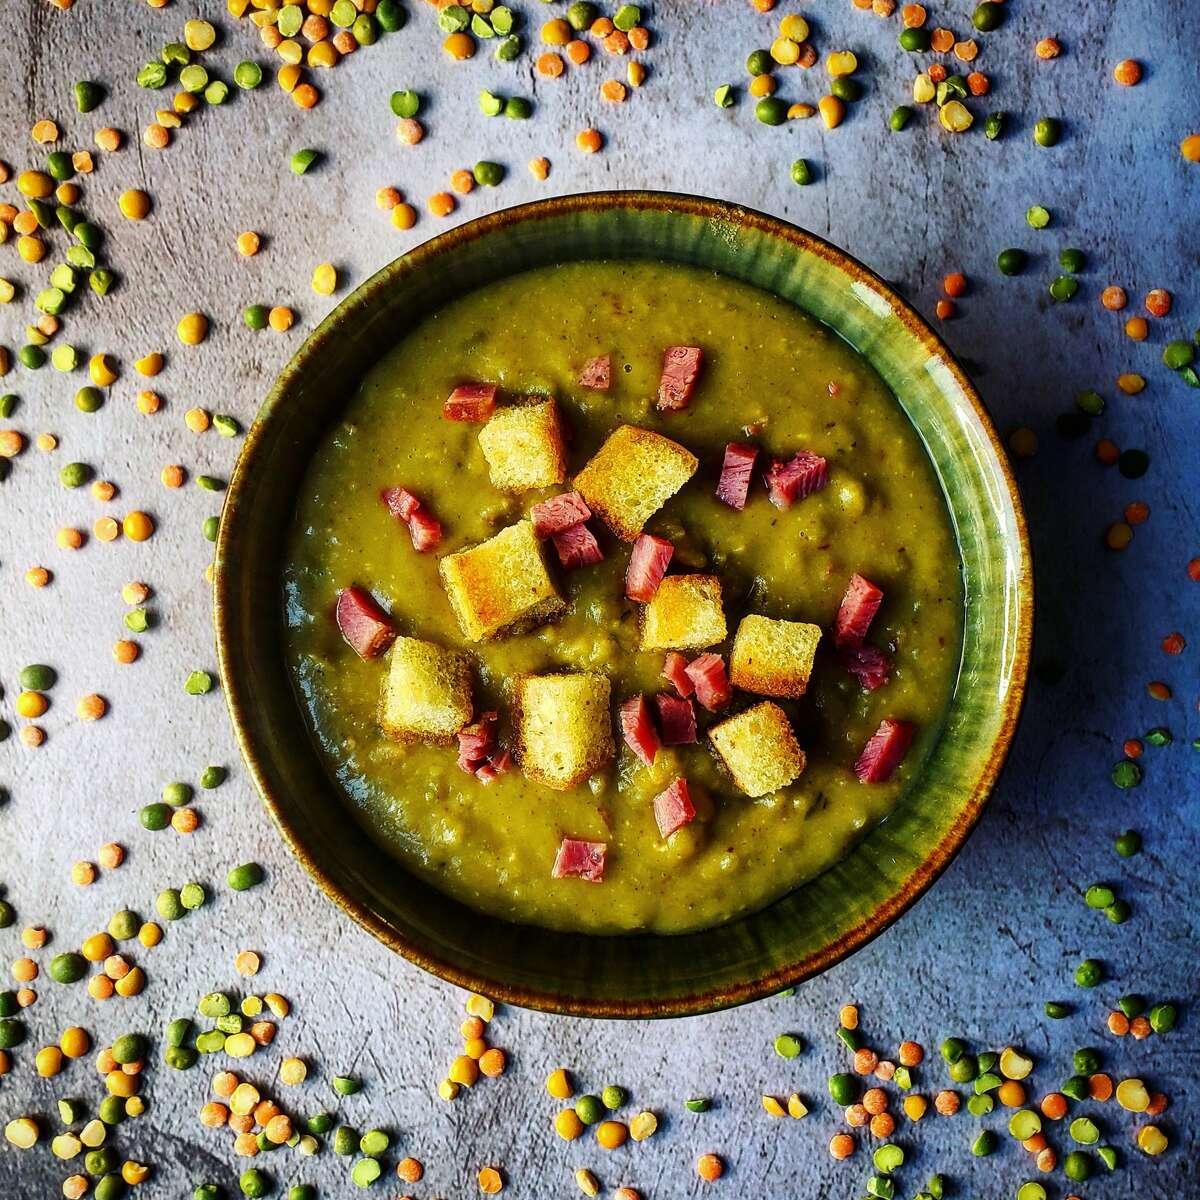 Split pea soup, by Deanna Fox.